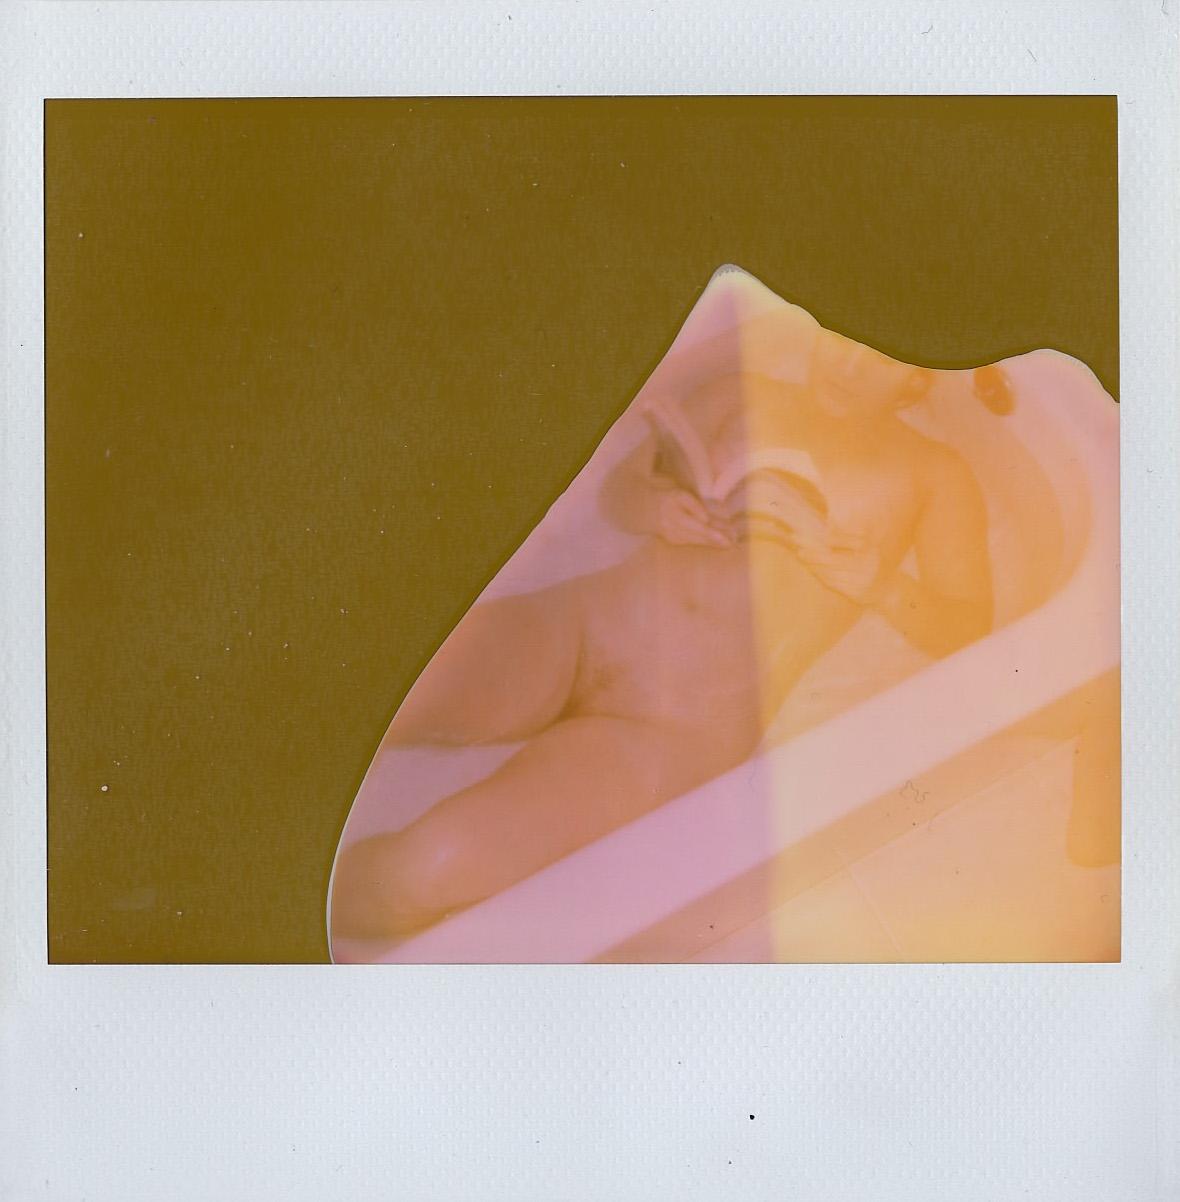 Rosie Lopeman in the bath - Brooklyn, NY - December 2016 - Expired Polaroid Spectra